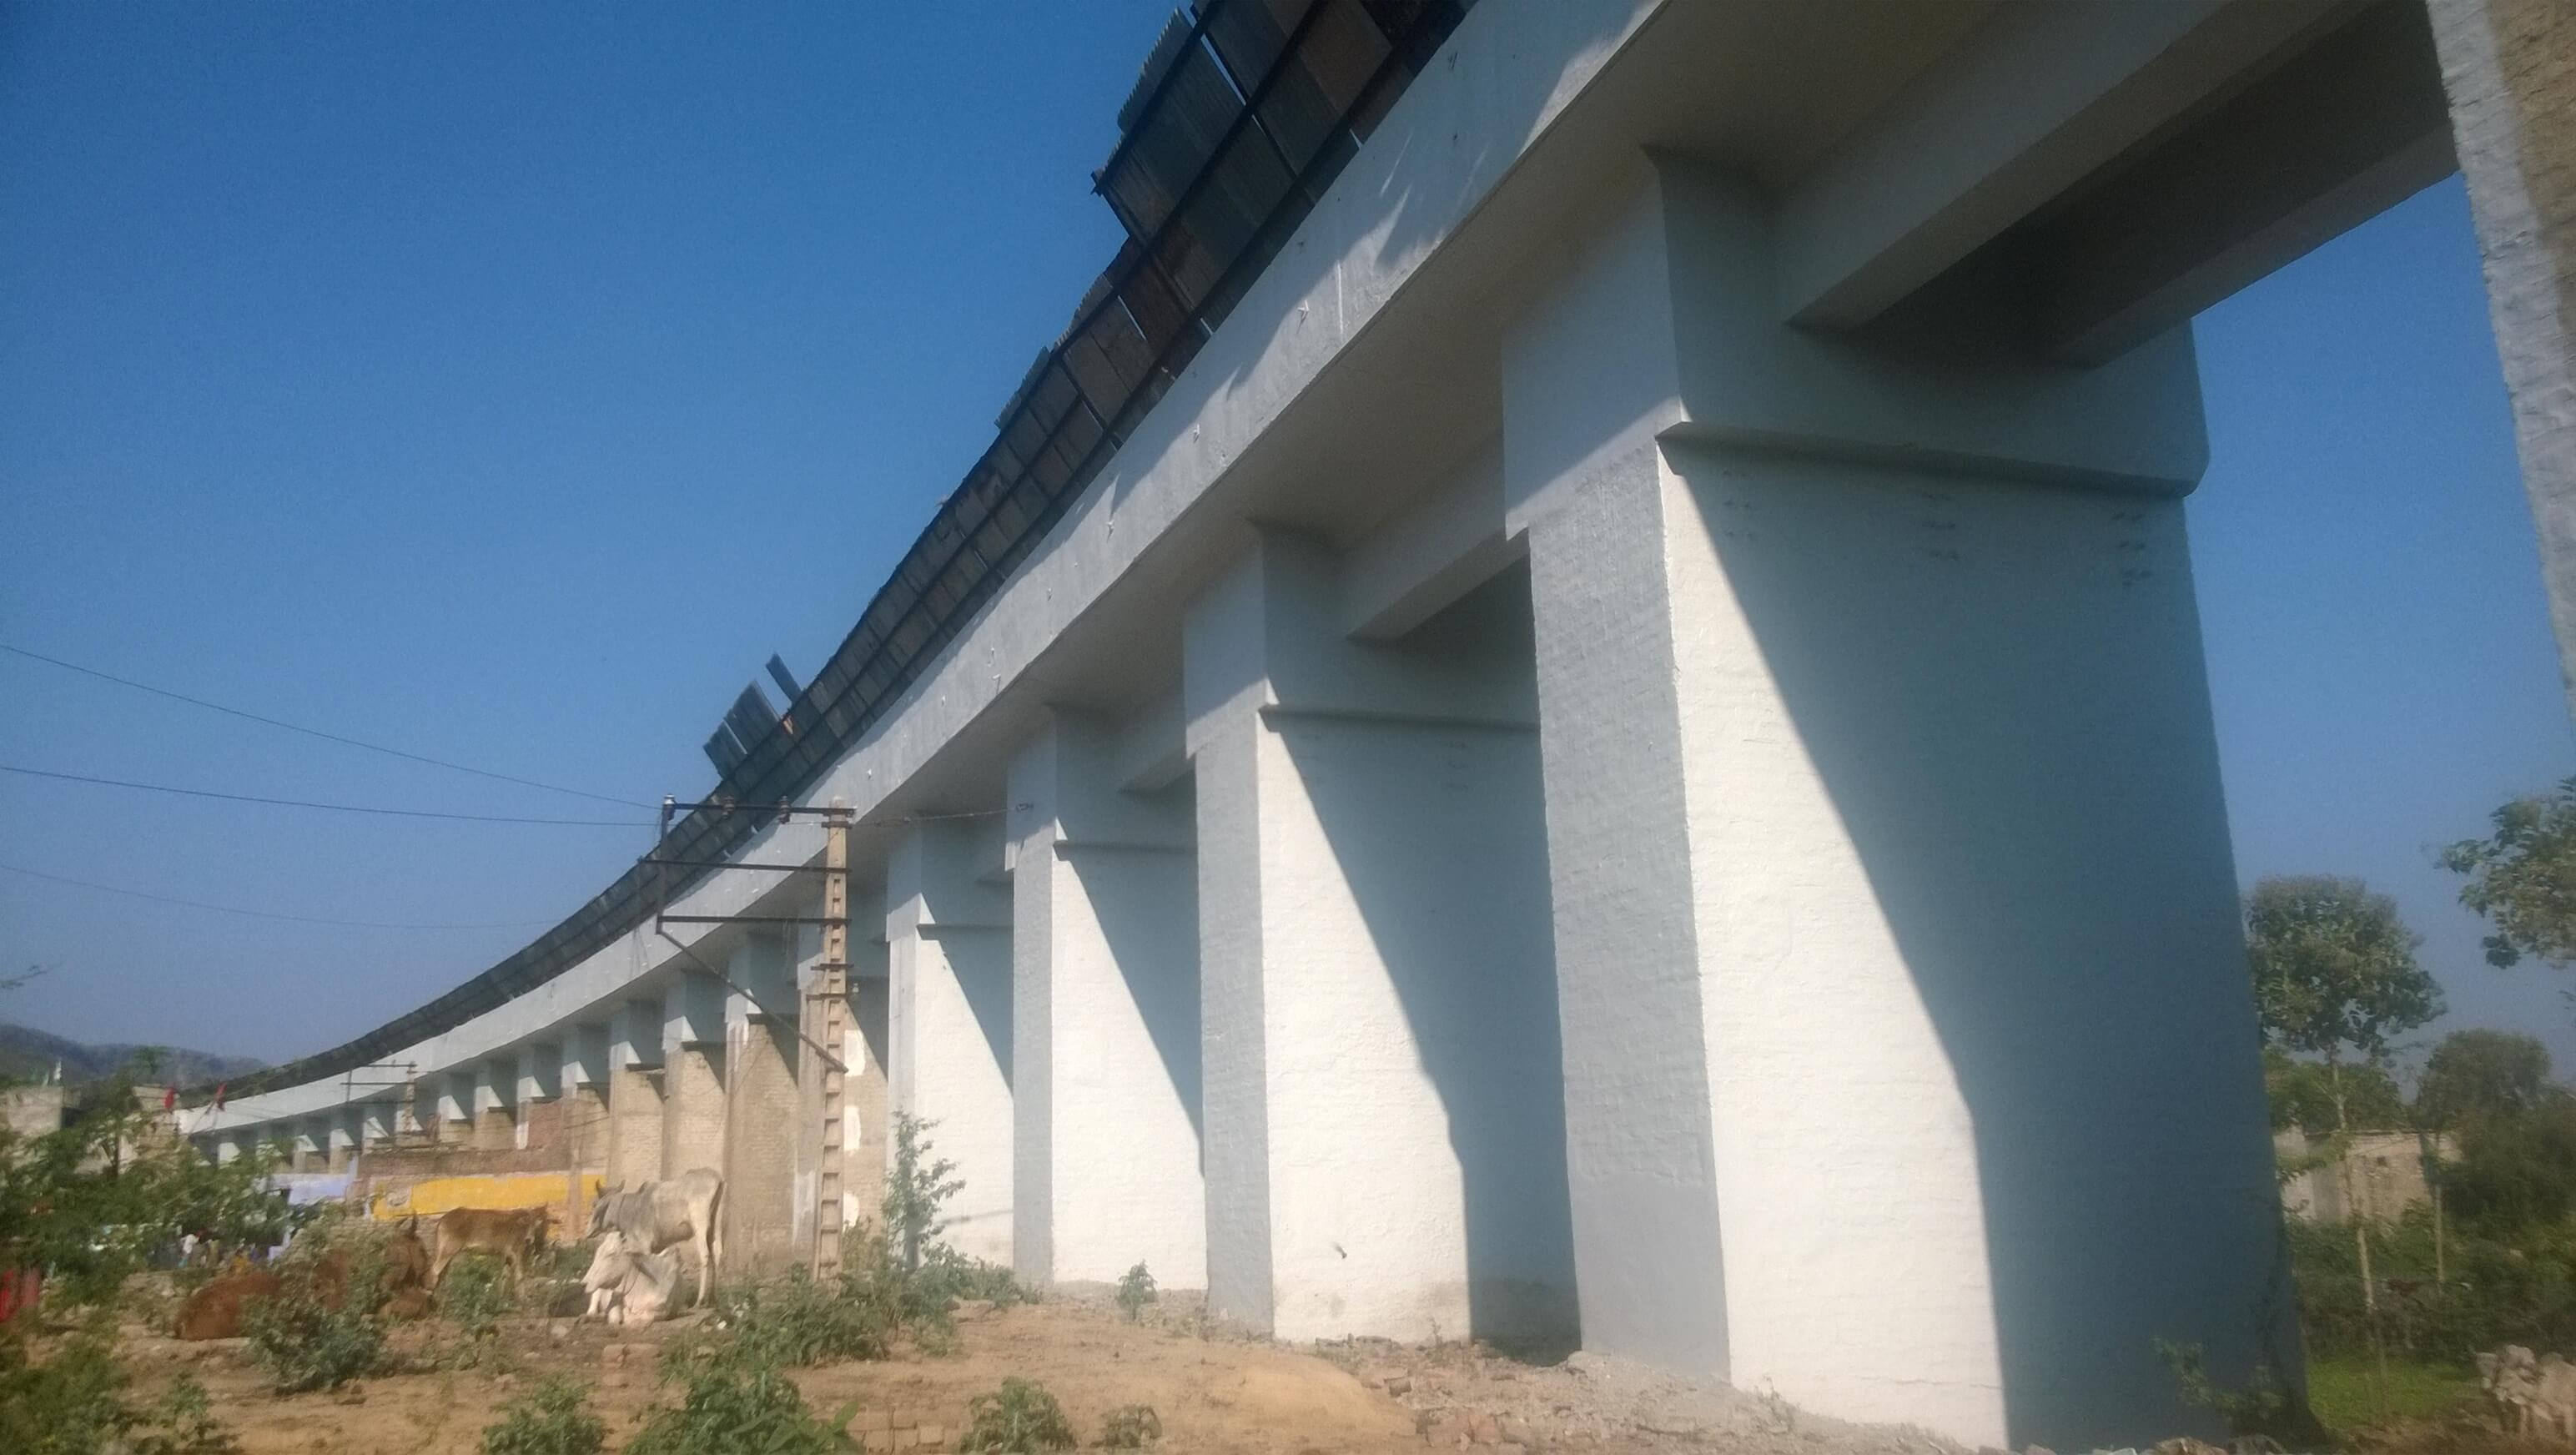 Structural Repair & Restoration of 13 nos. of Culverts & Bridges